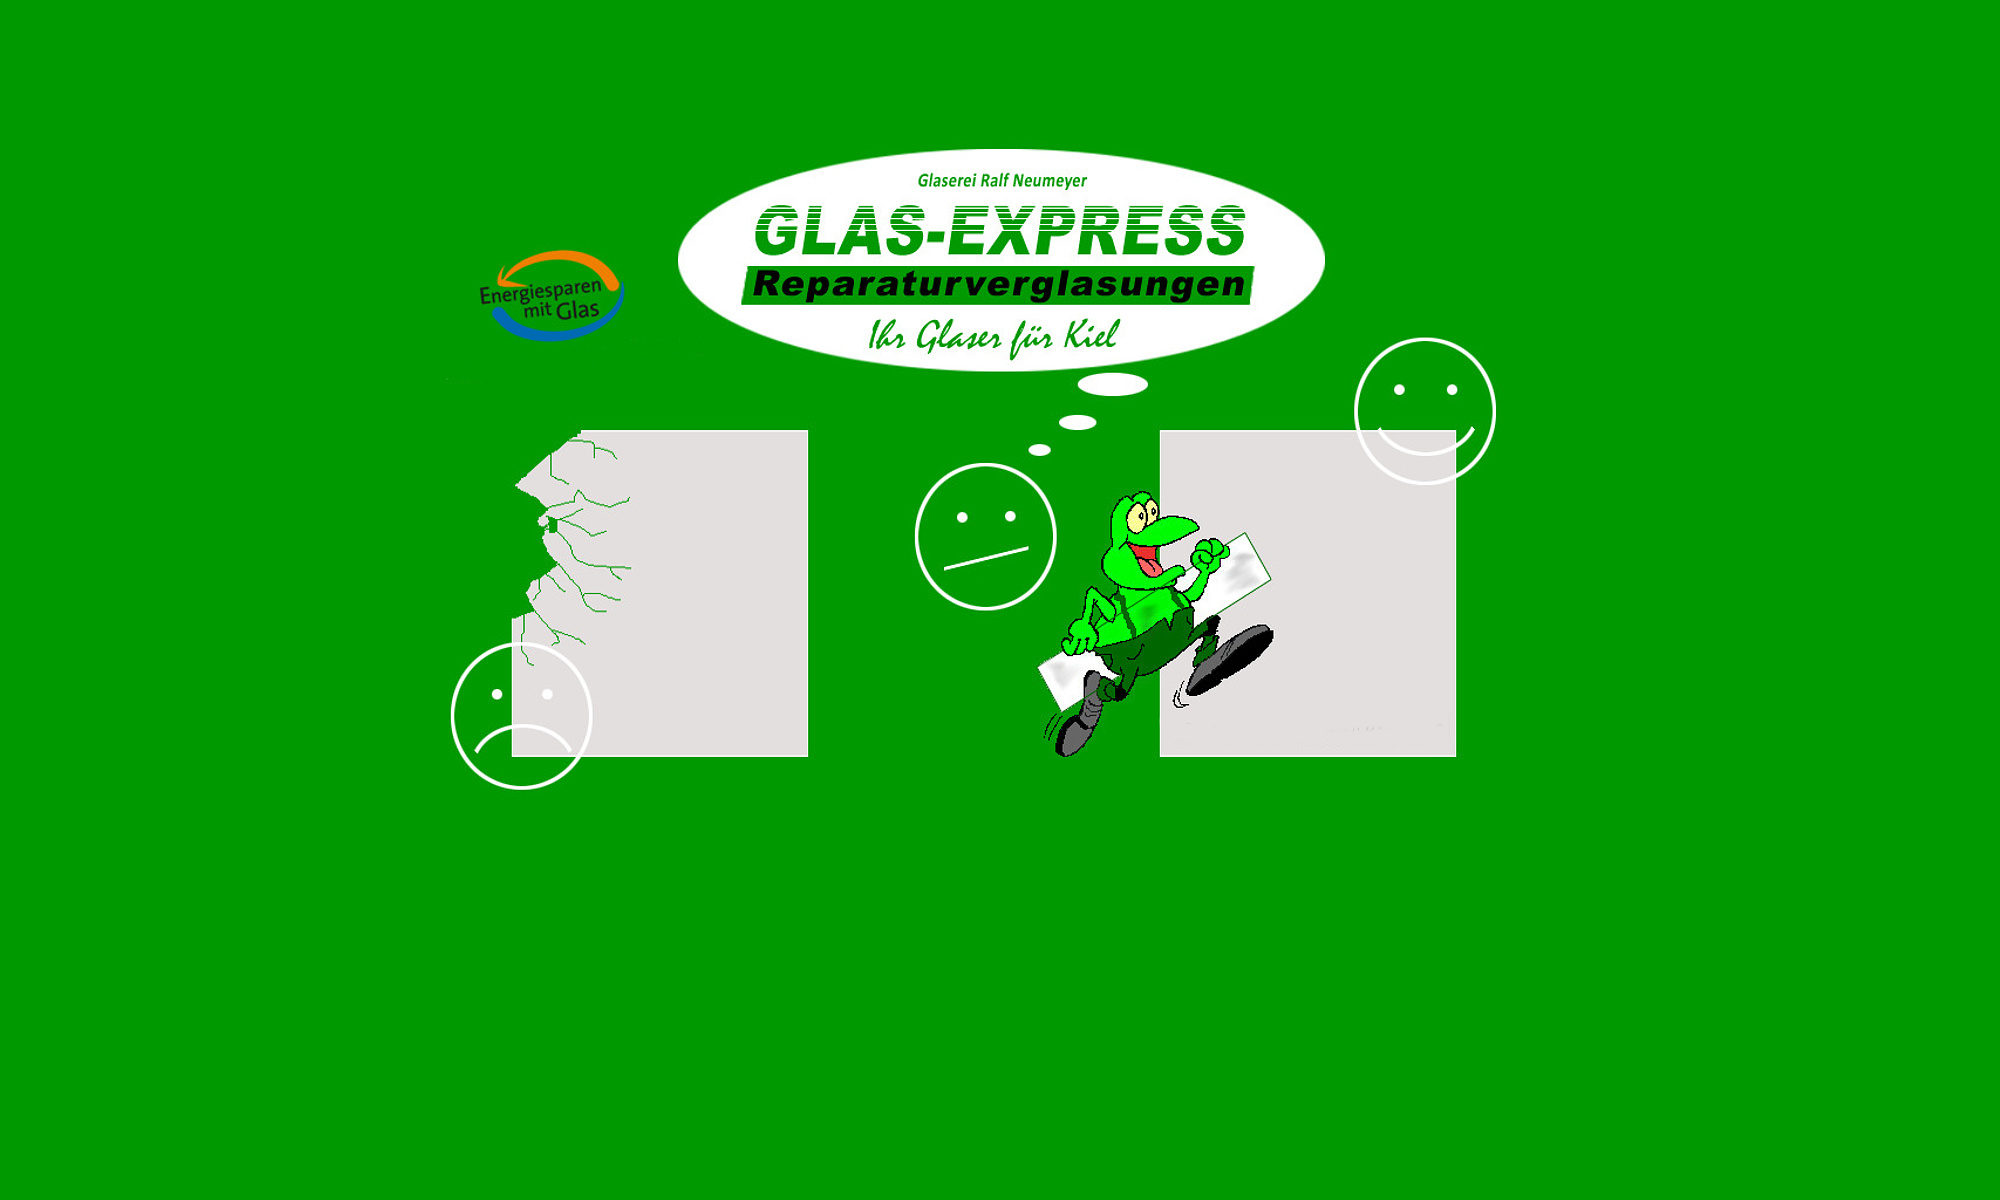 Glas-Express